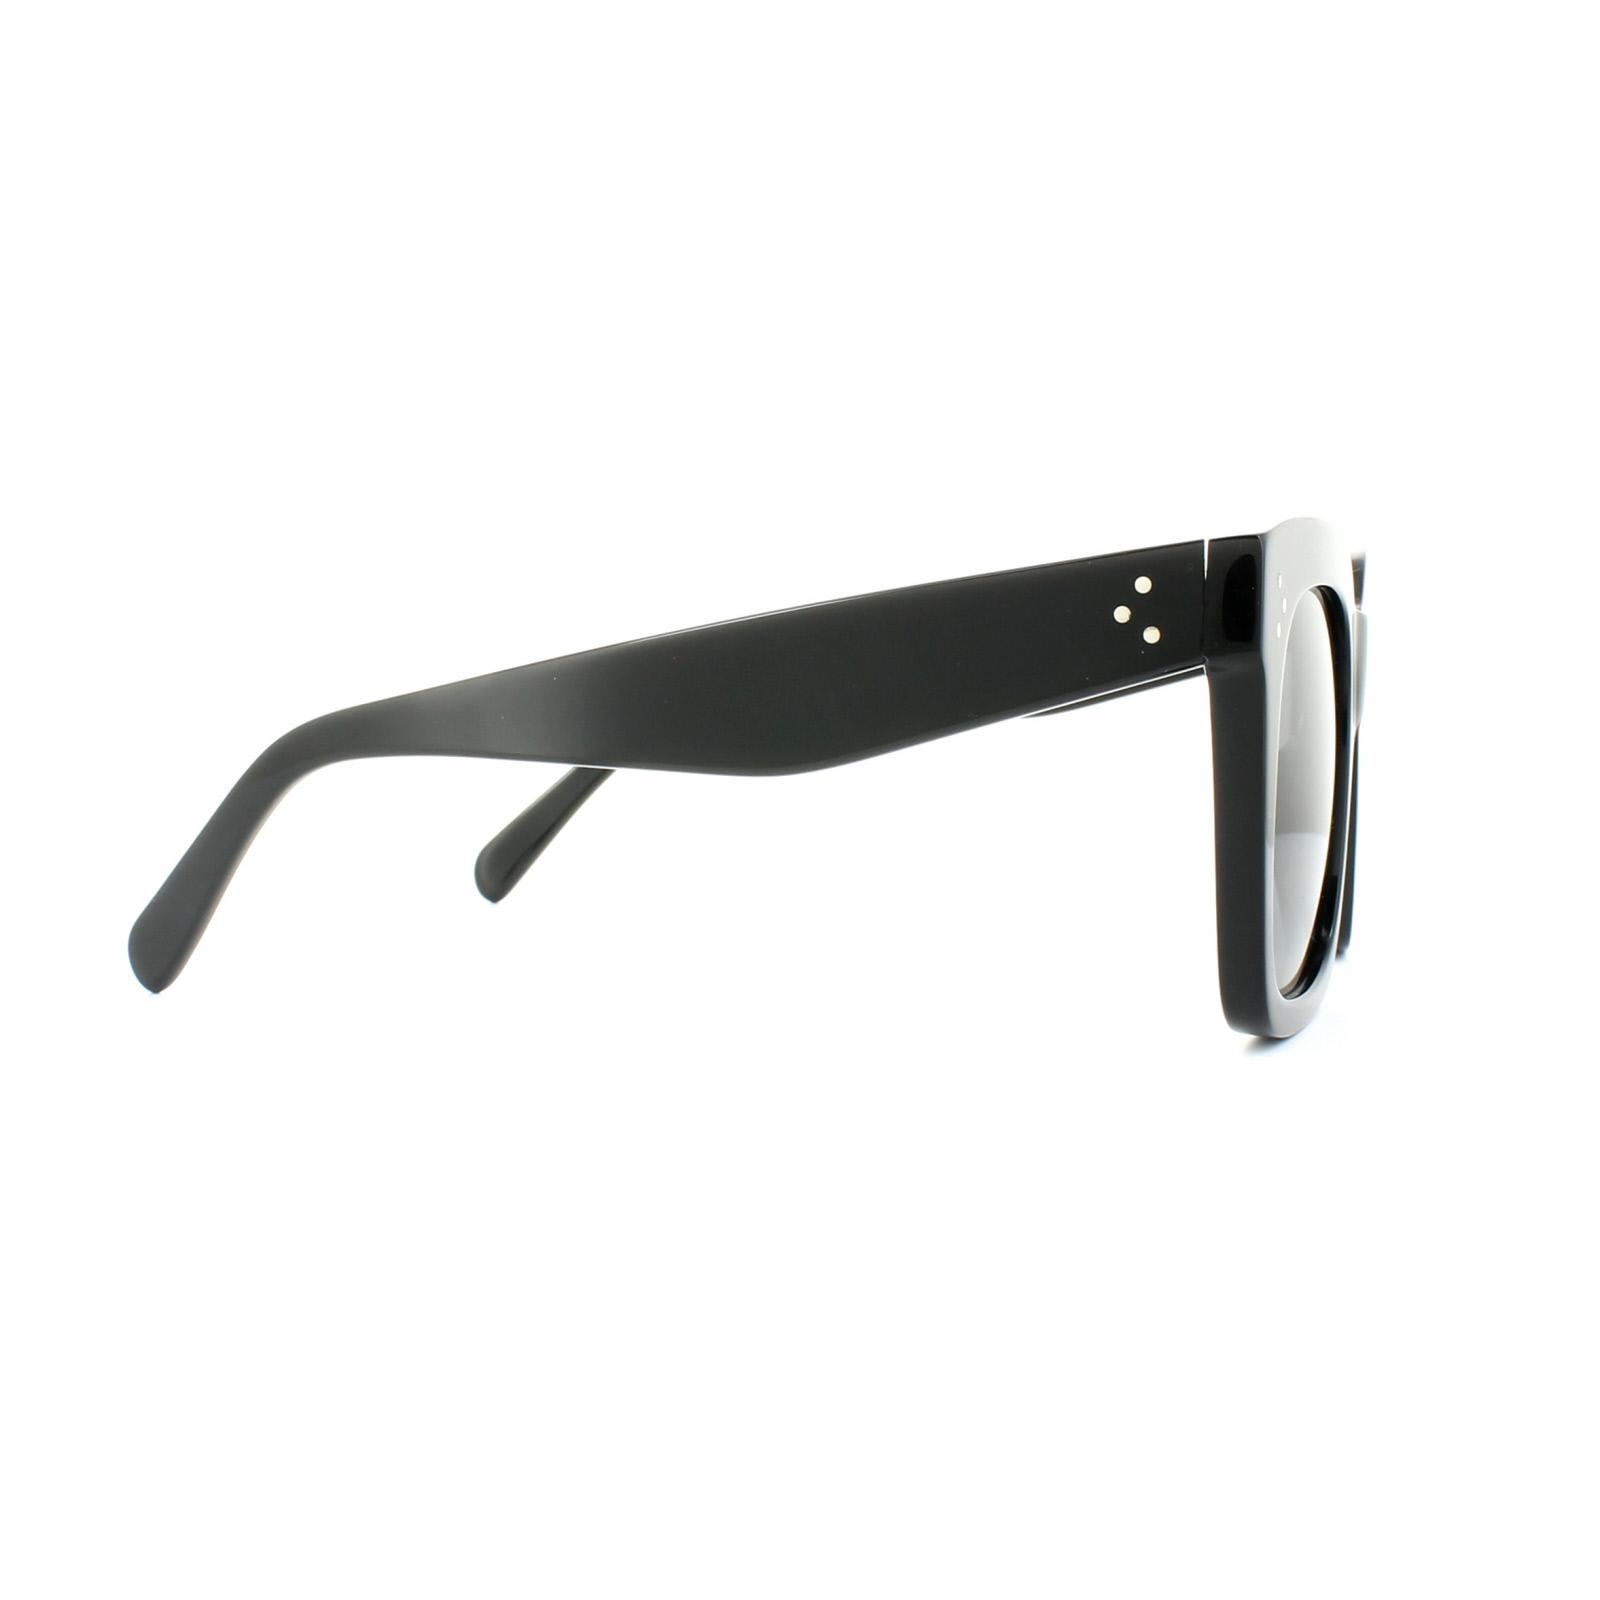 d1c031c6aad2 ... Celine Sunglasses 41076/S Tilda 807 BN Black Dark Grey Thumbnail 4 ...